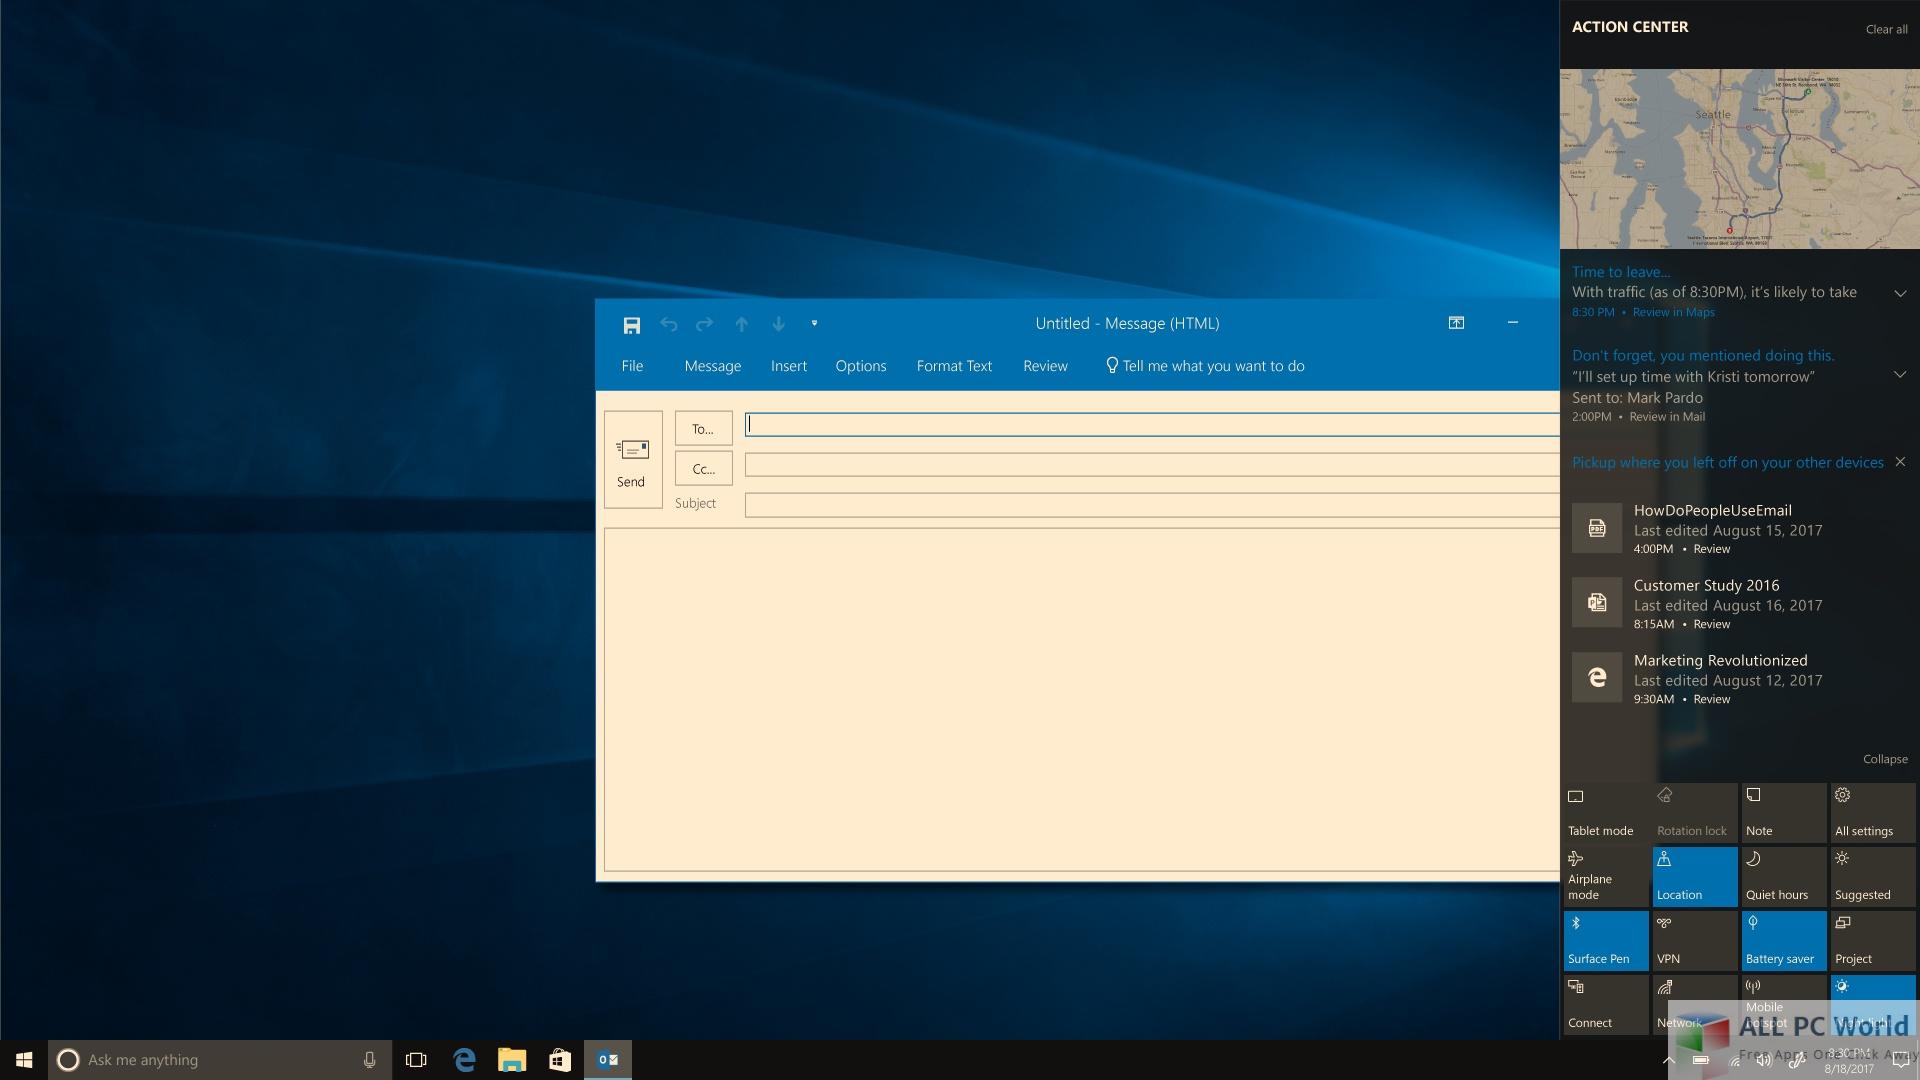 Download Windows 10 Enterprise Creators Update April 2017 Free